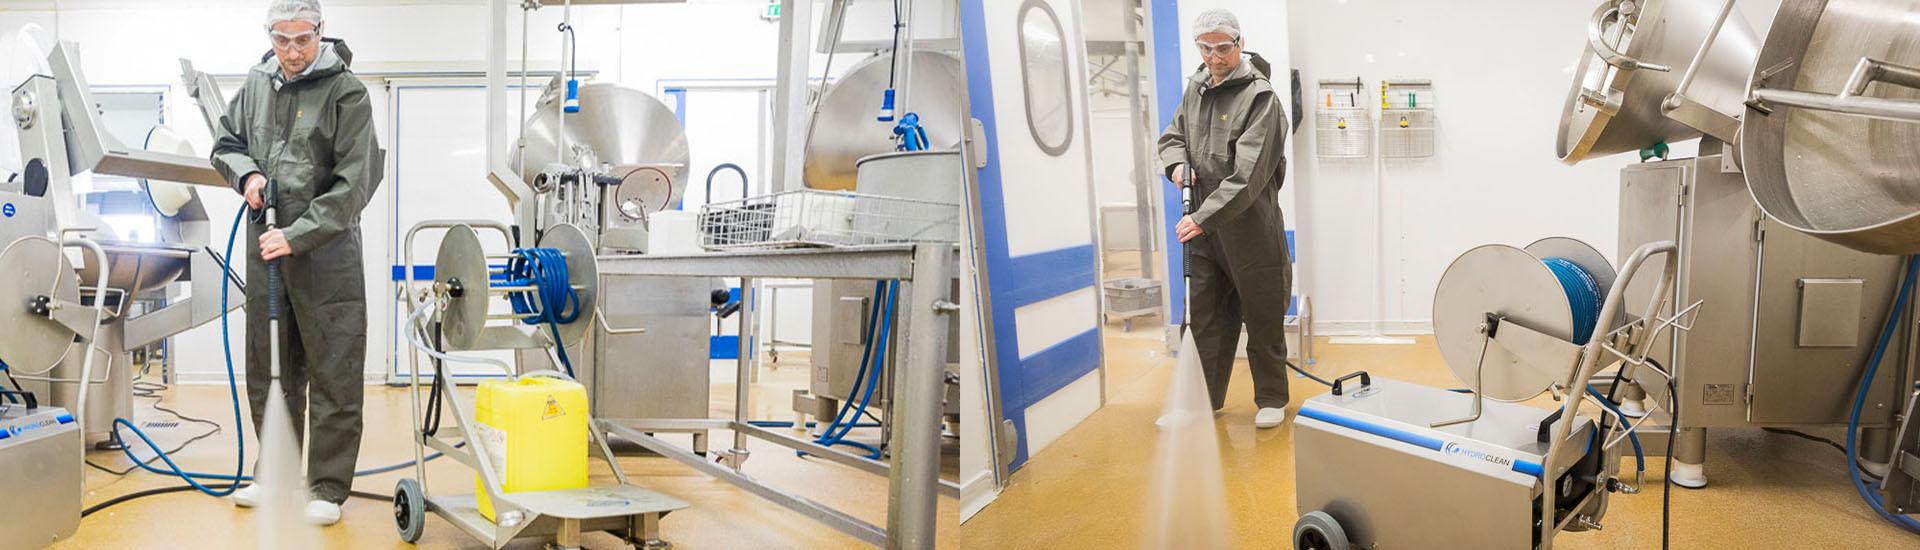 Nettoyeur haute pression et moyenne pression Hydroclean pour agro-alimentaire